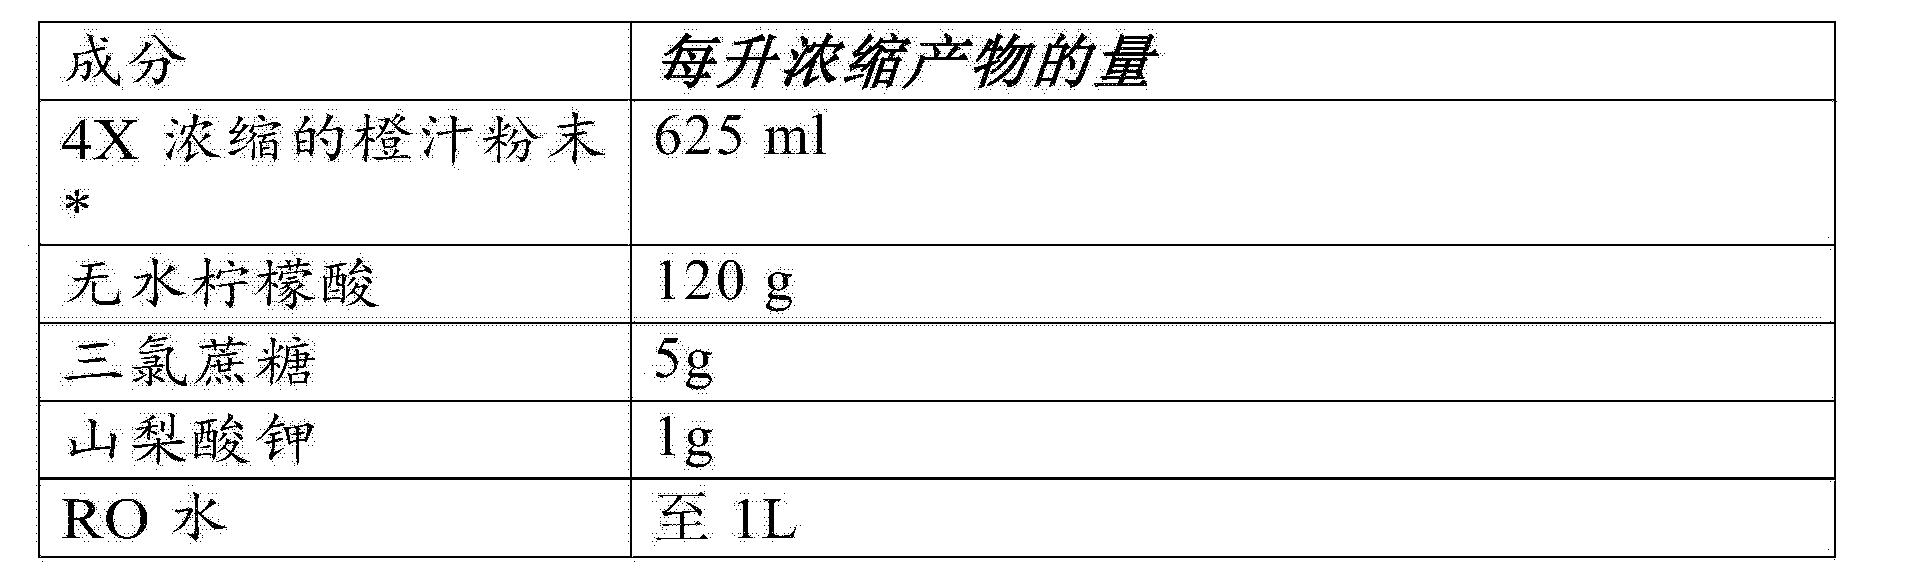 Figure CN104427888AD00071